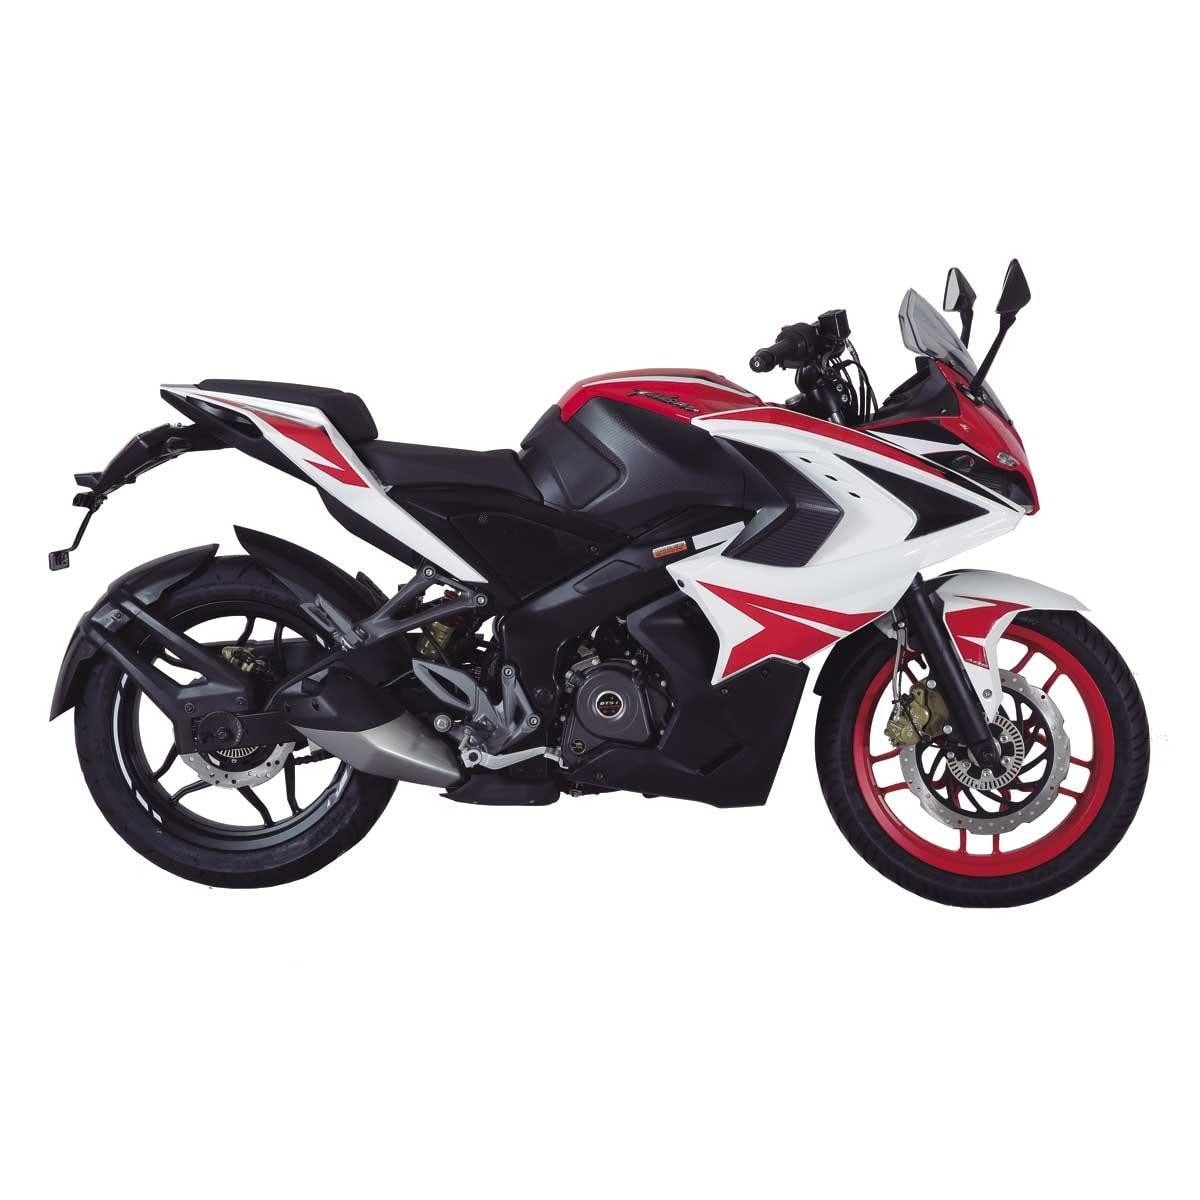 Motocicleta Pulsar Rs 200 Cc Roja Bajaj